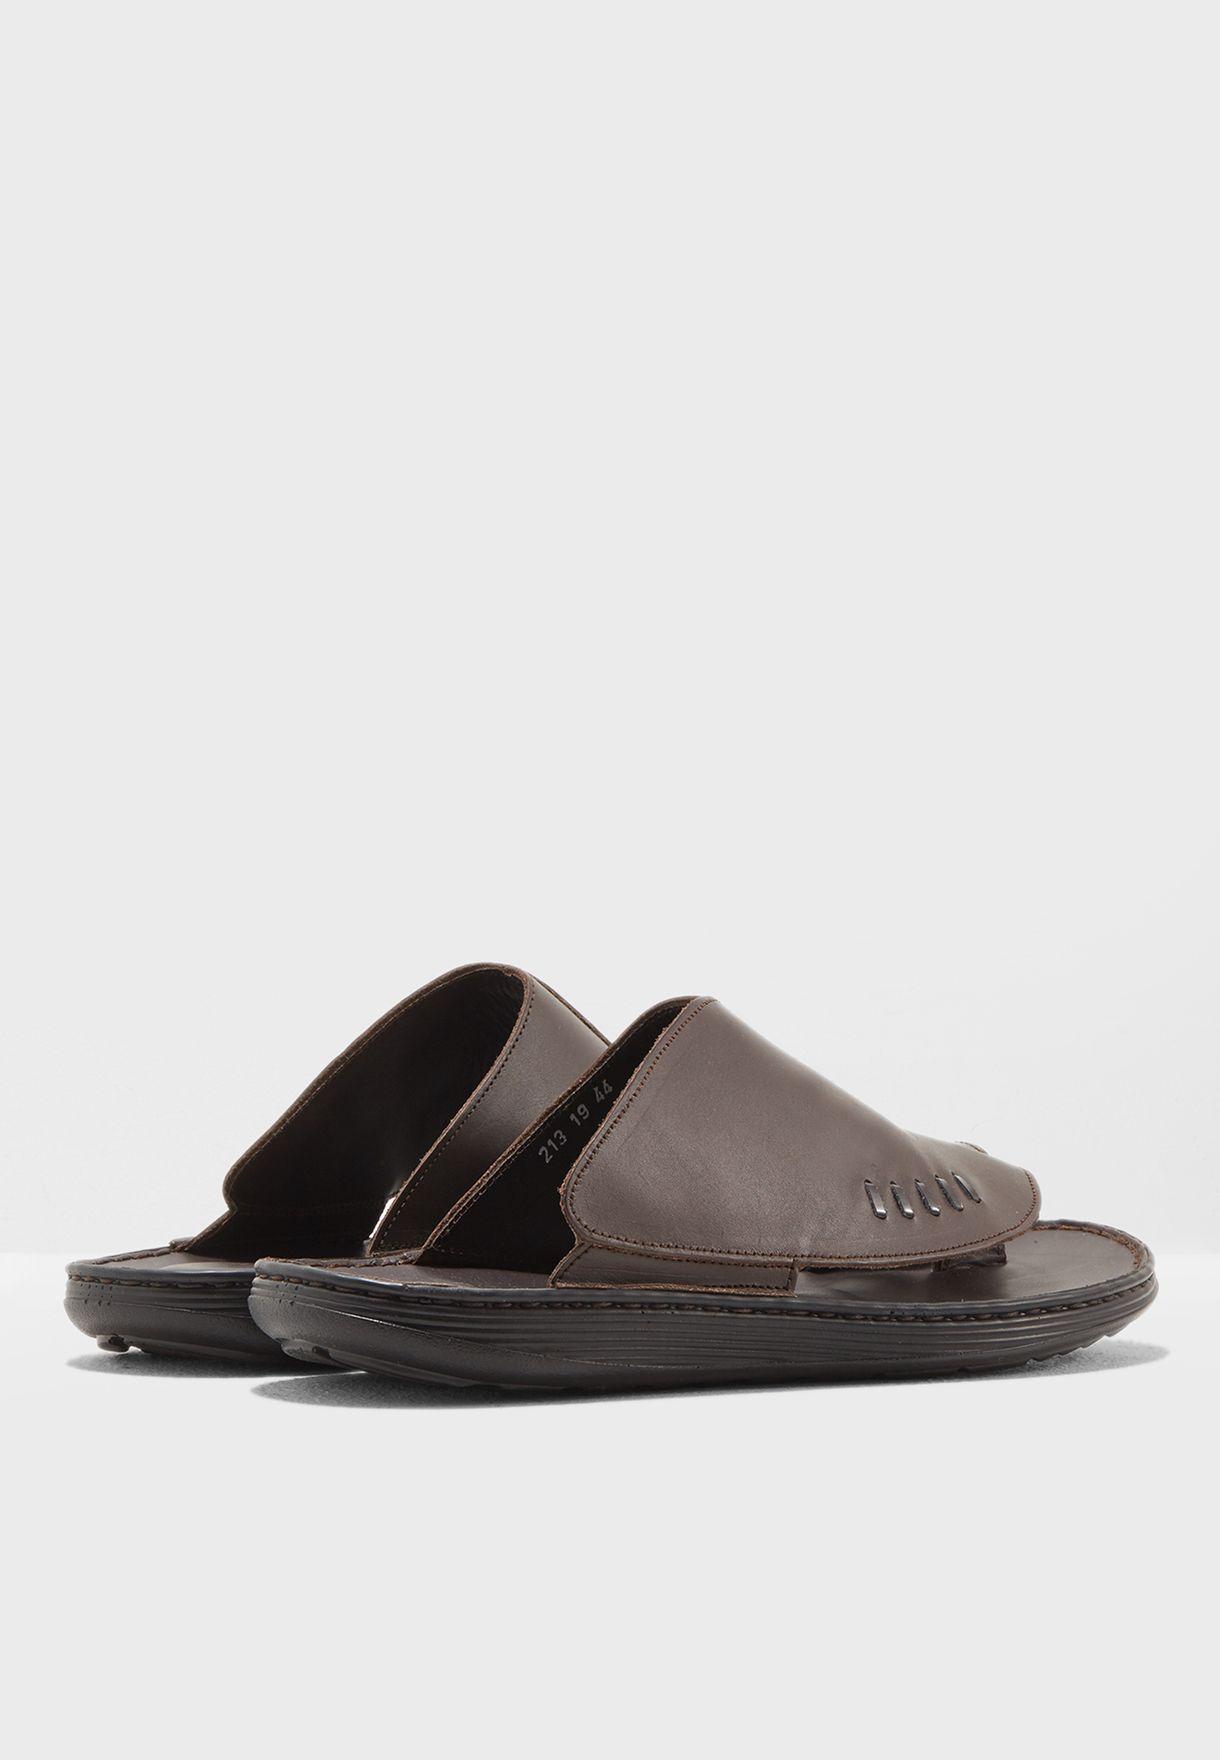 Arabian Sandals